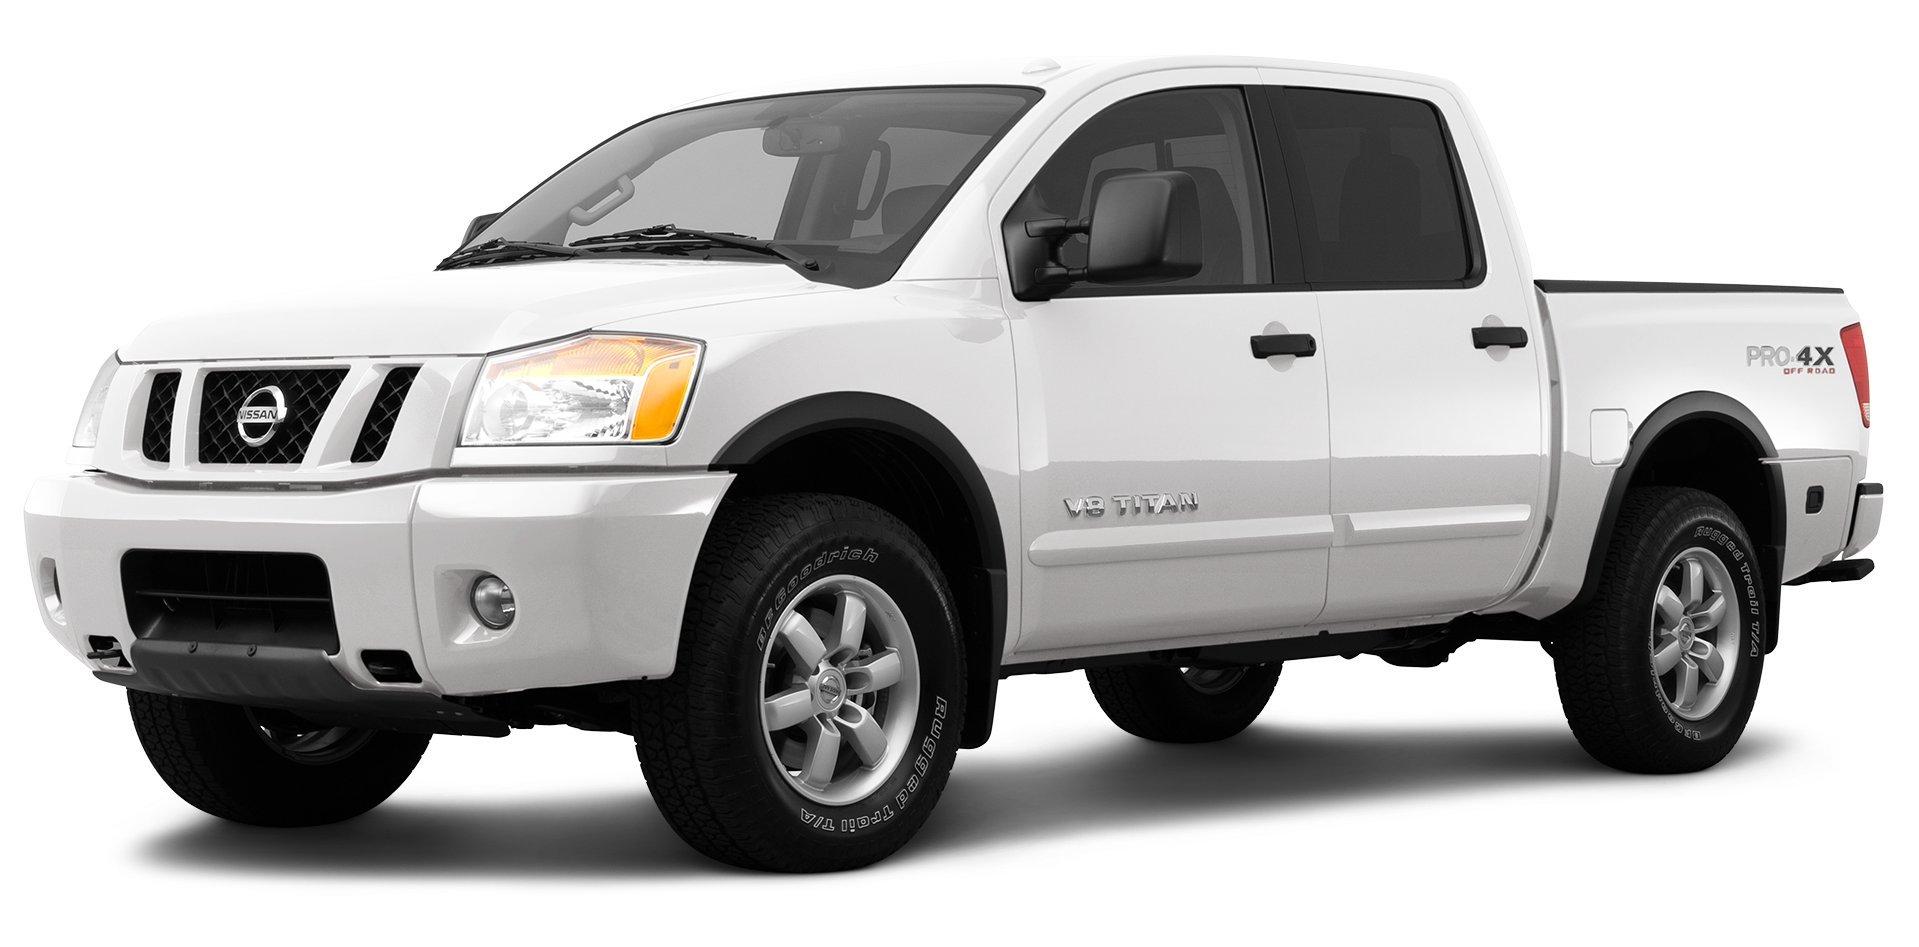 2012 nissan titan pro 4x 4 wheel drive crew cab short wheelbase